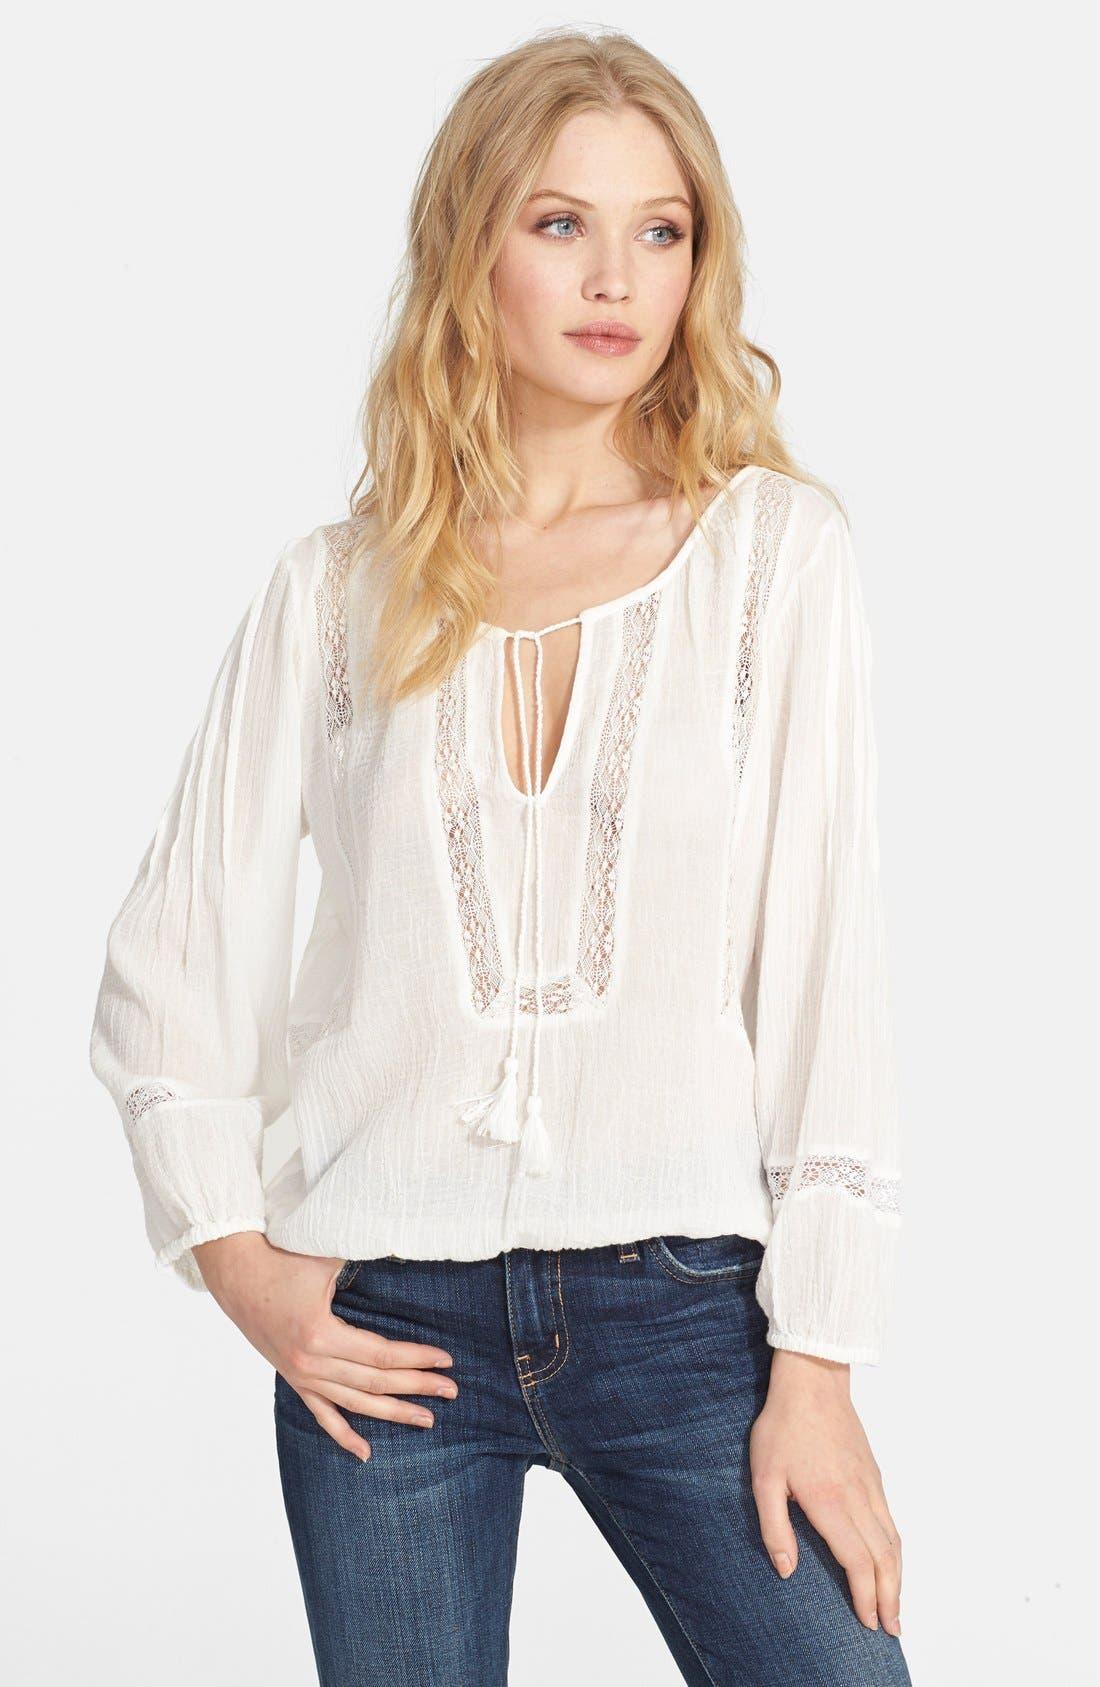 Alternate Image 1 Selected - Joie 'Arcene' Cotton Peasant Top